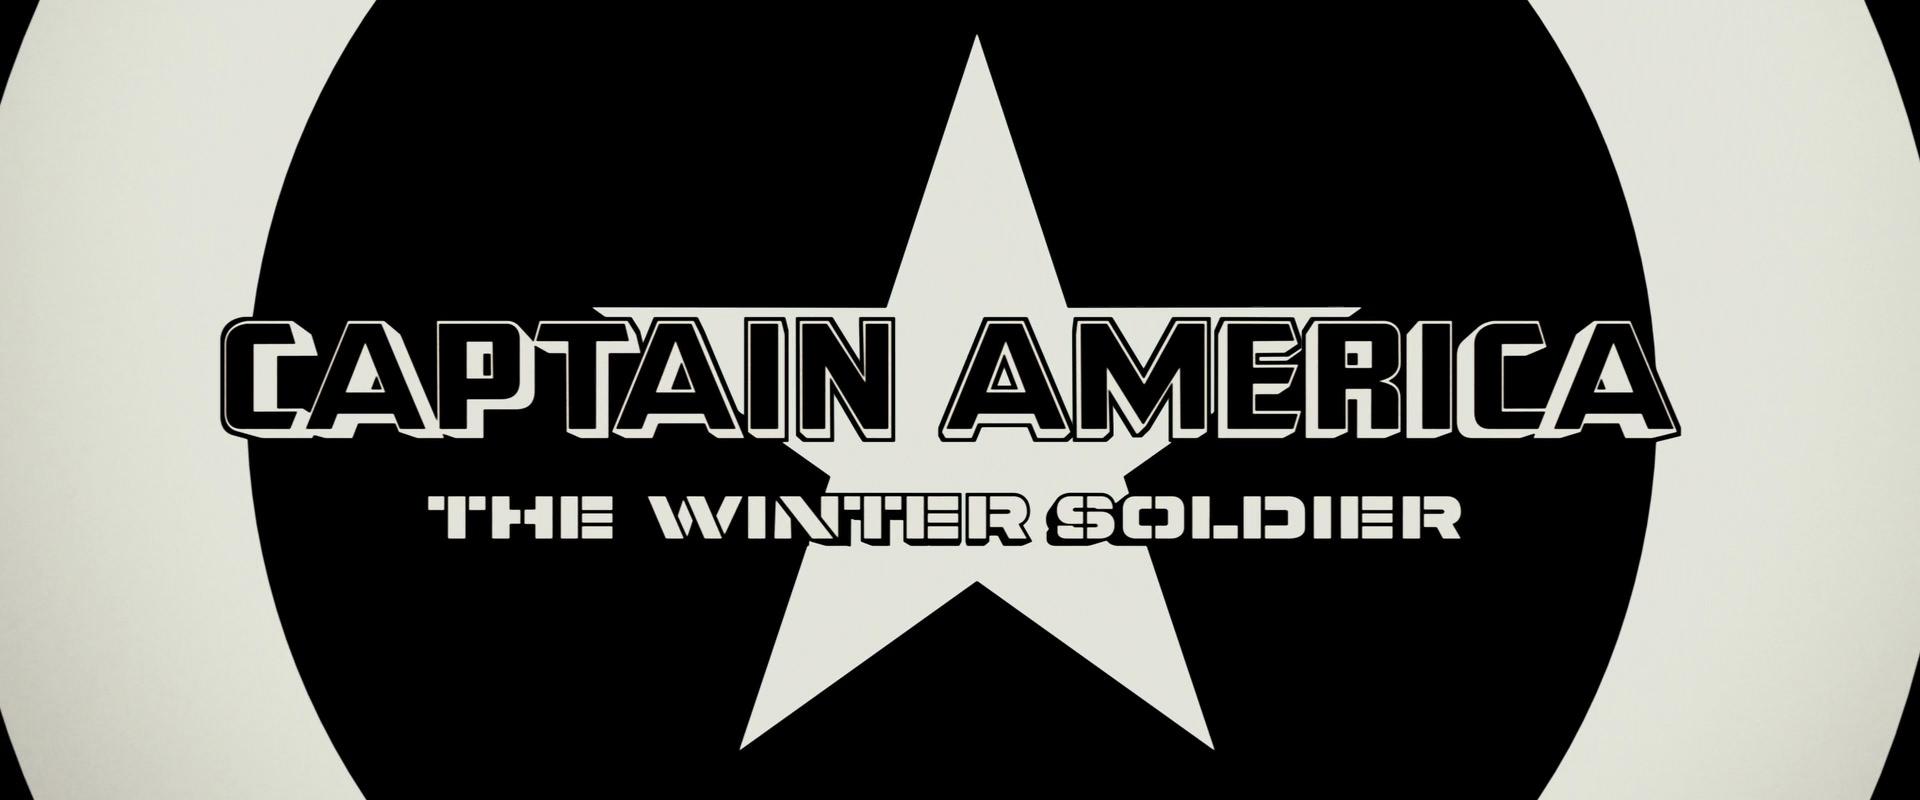 Captain America The Winter Soldier 20   Movie  Screencaps.com